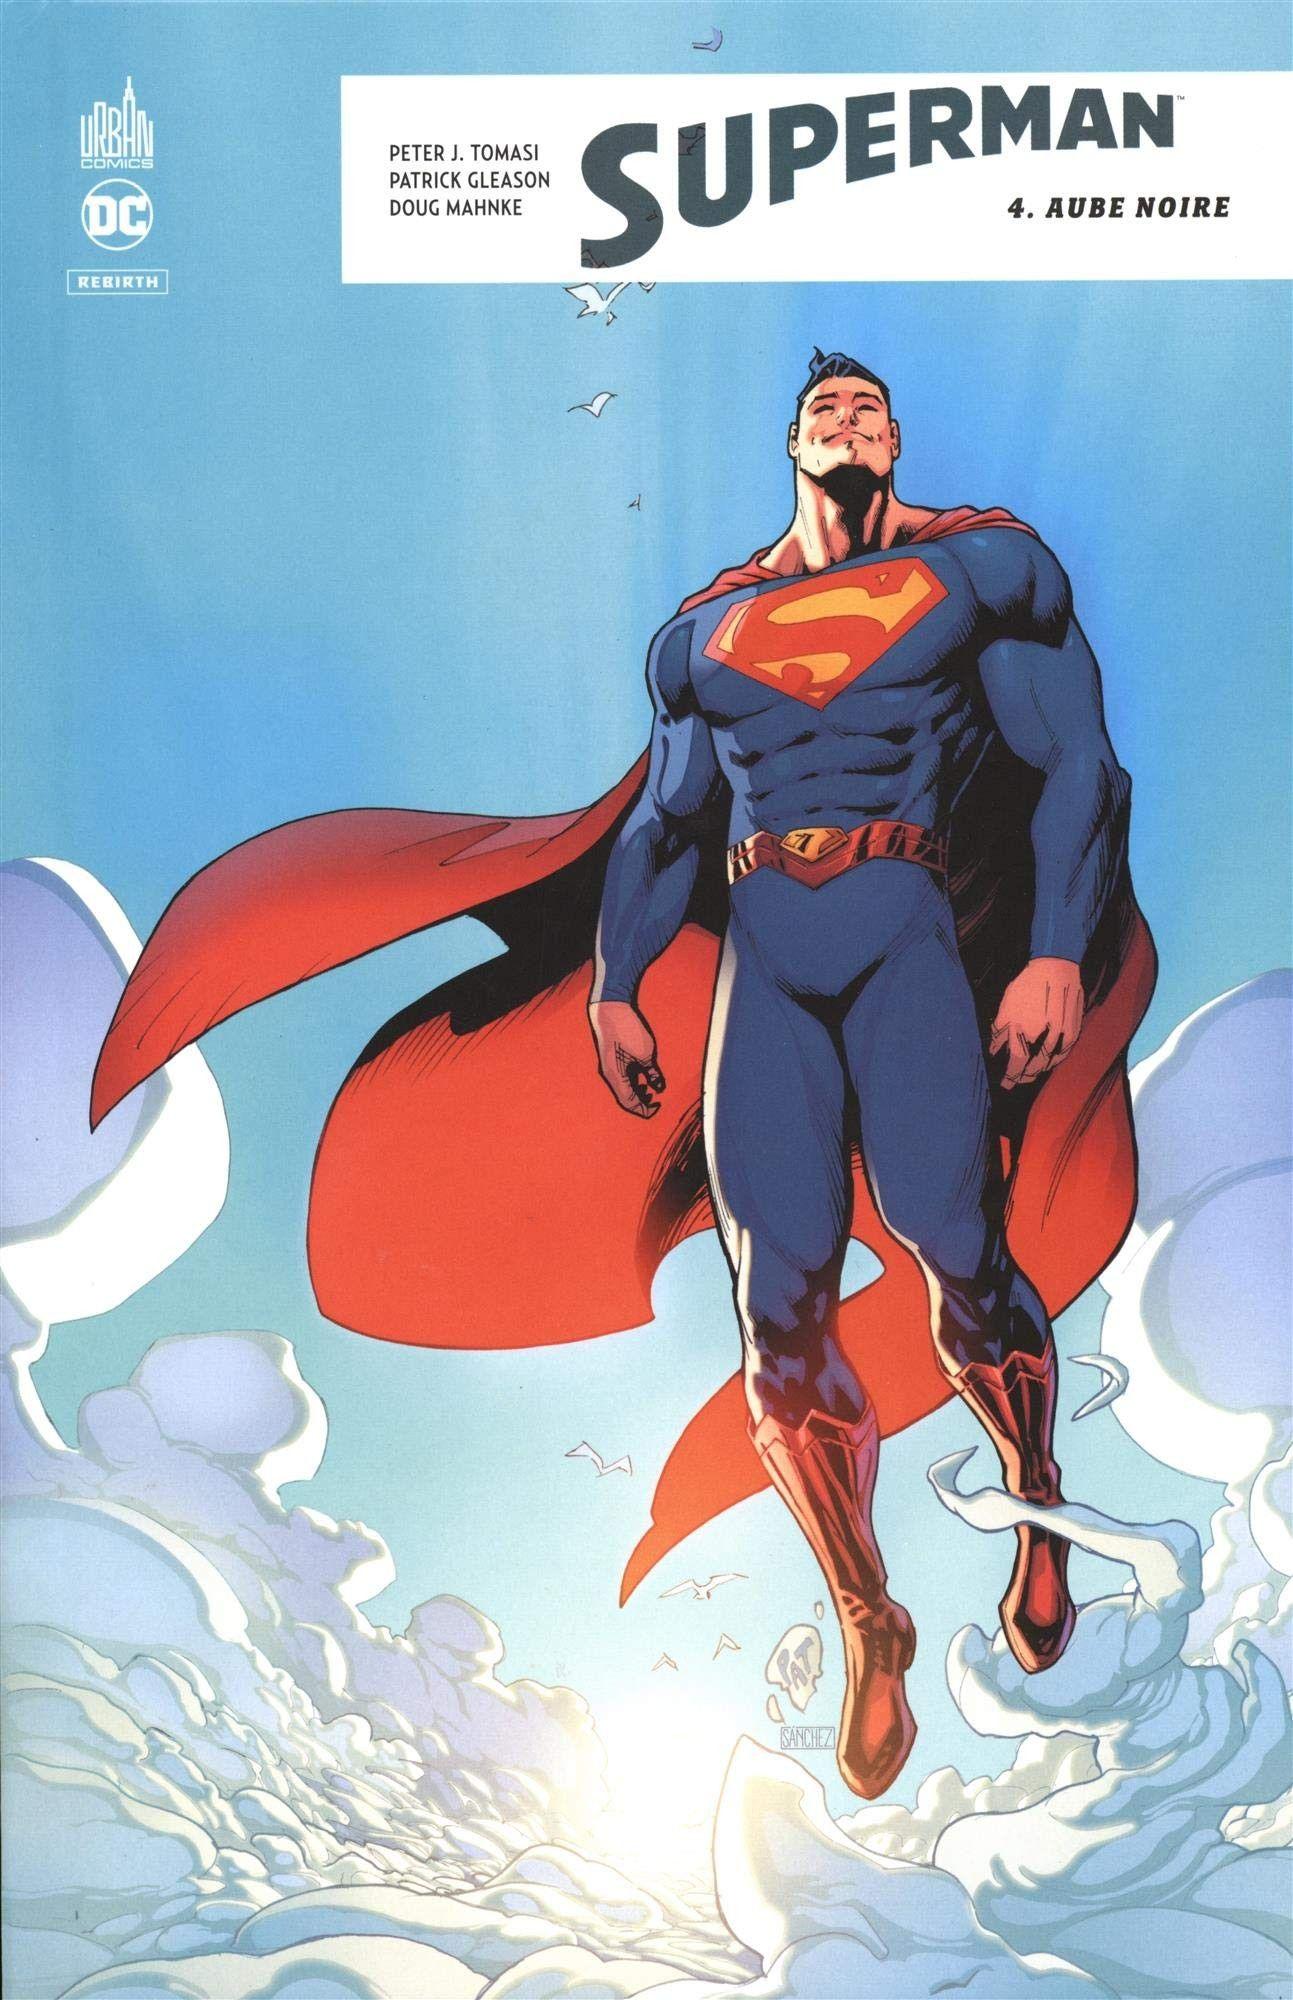 Superman - 4 - Aube noire - Peter J  Tomasi, Patrick Gleason, Doug